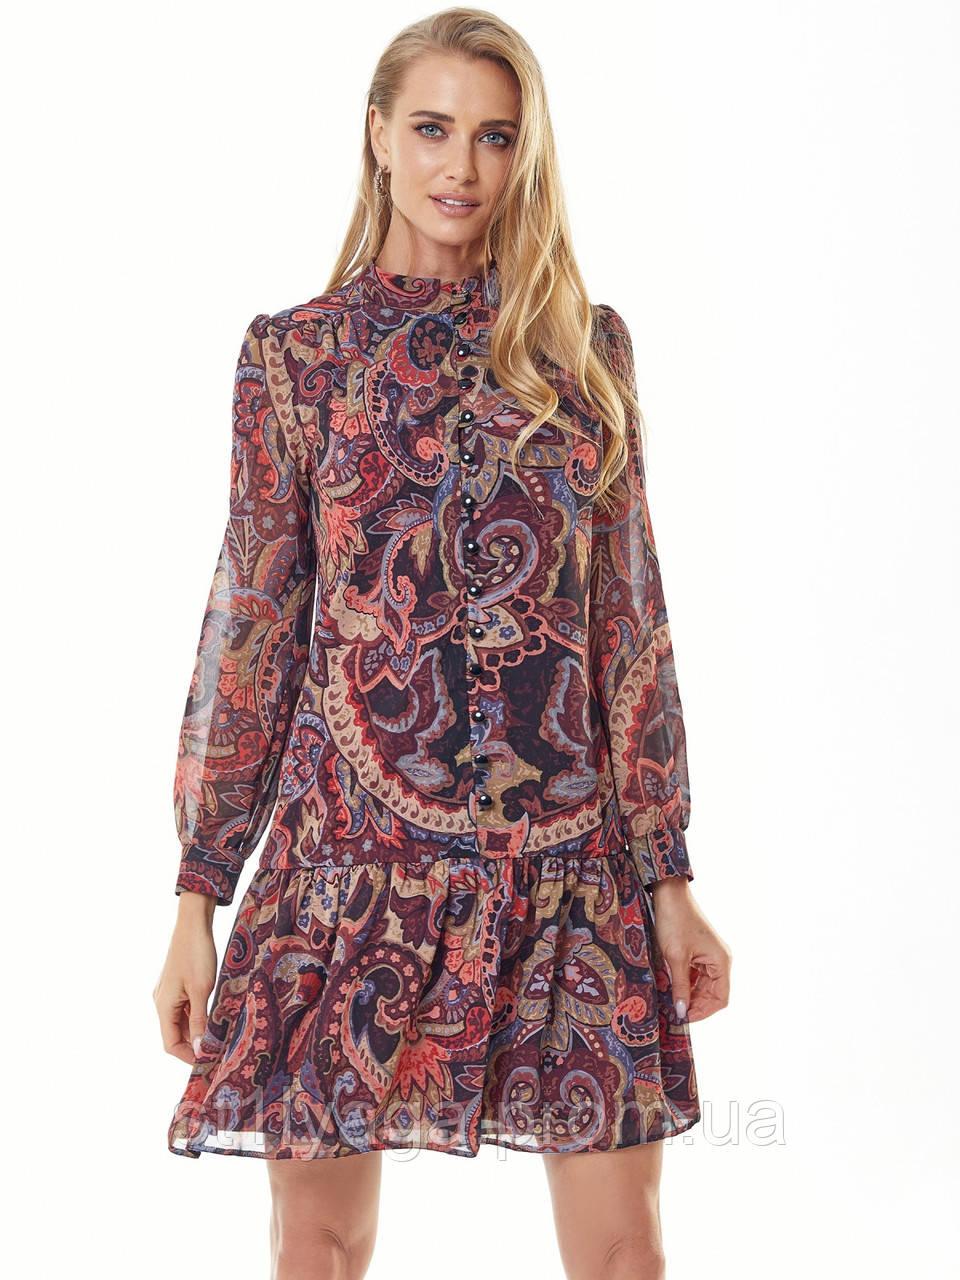 Шифонове плаття з принтом і воланом по низу